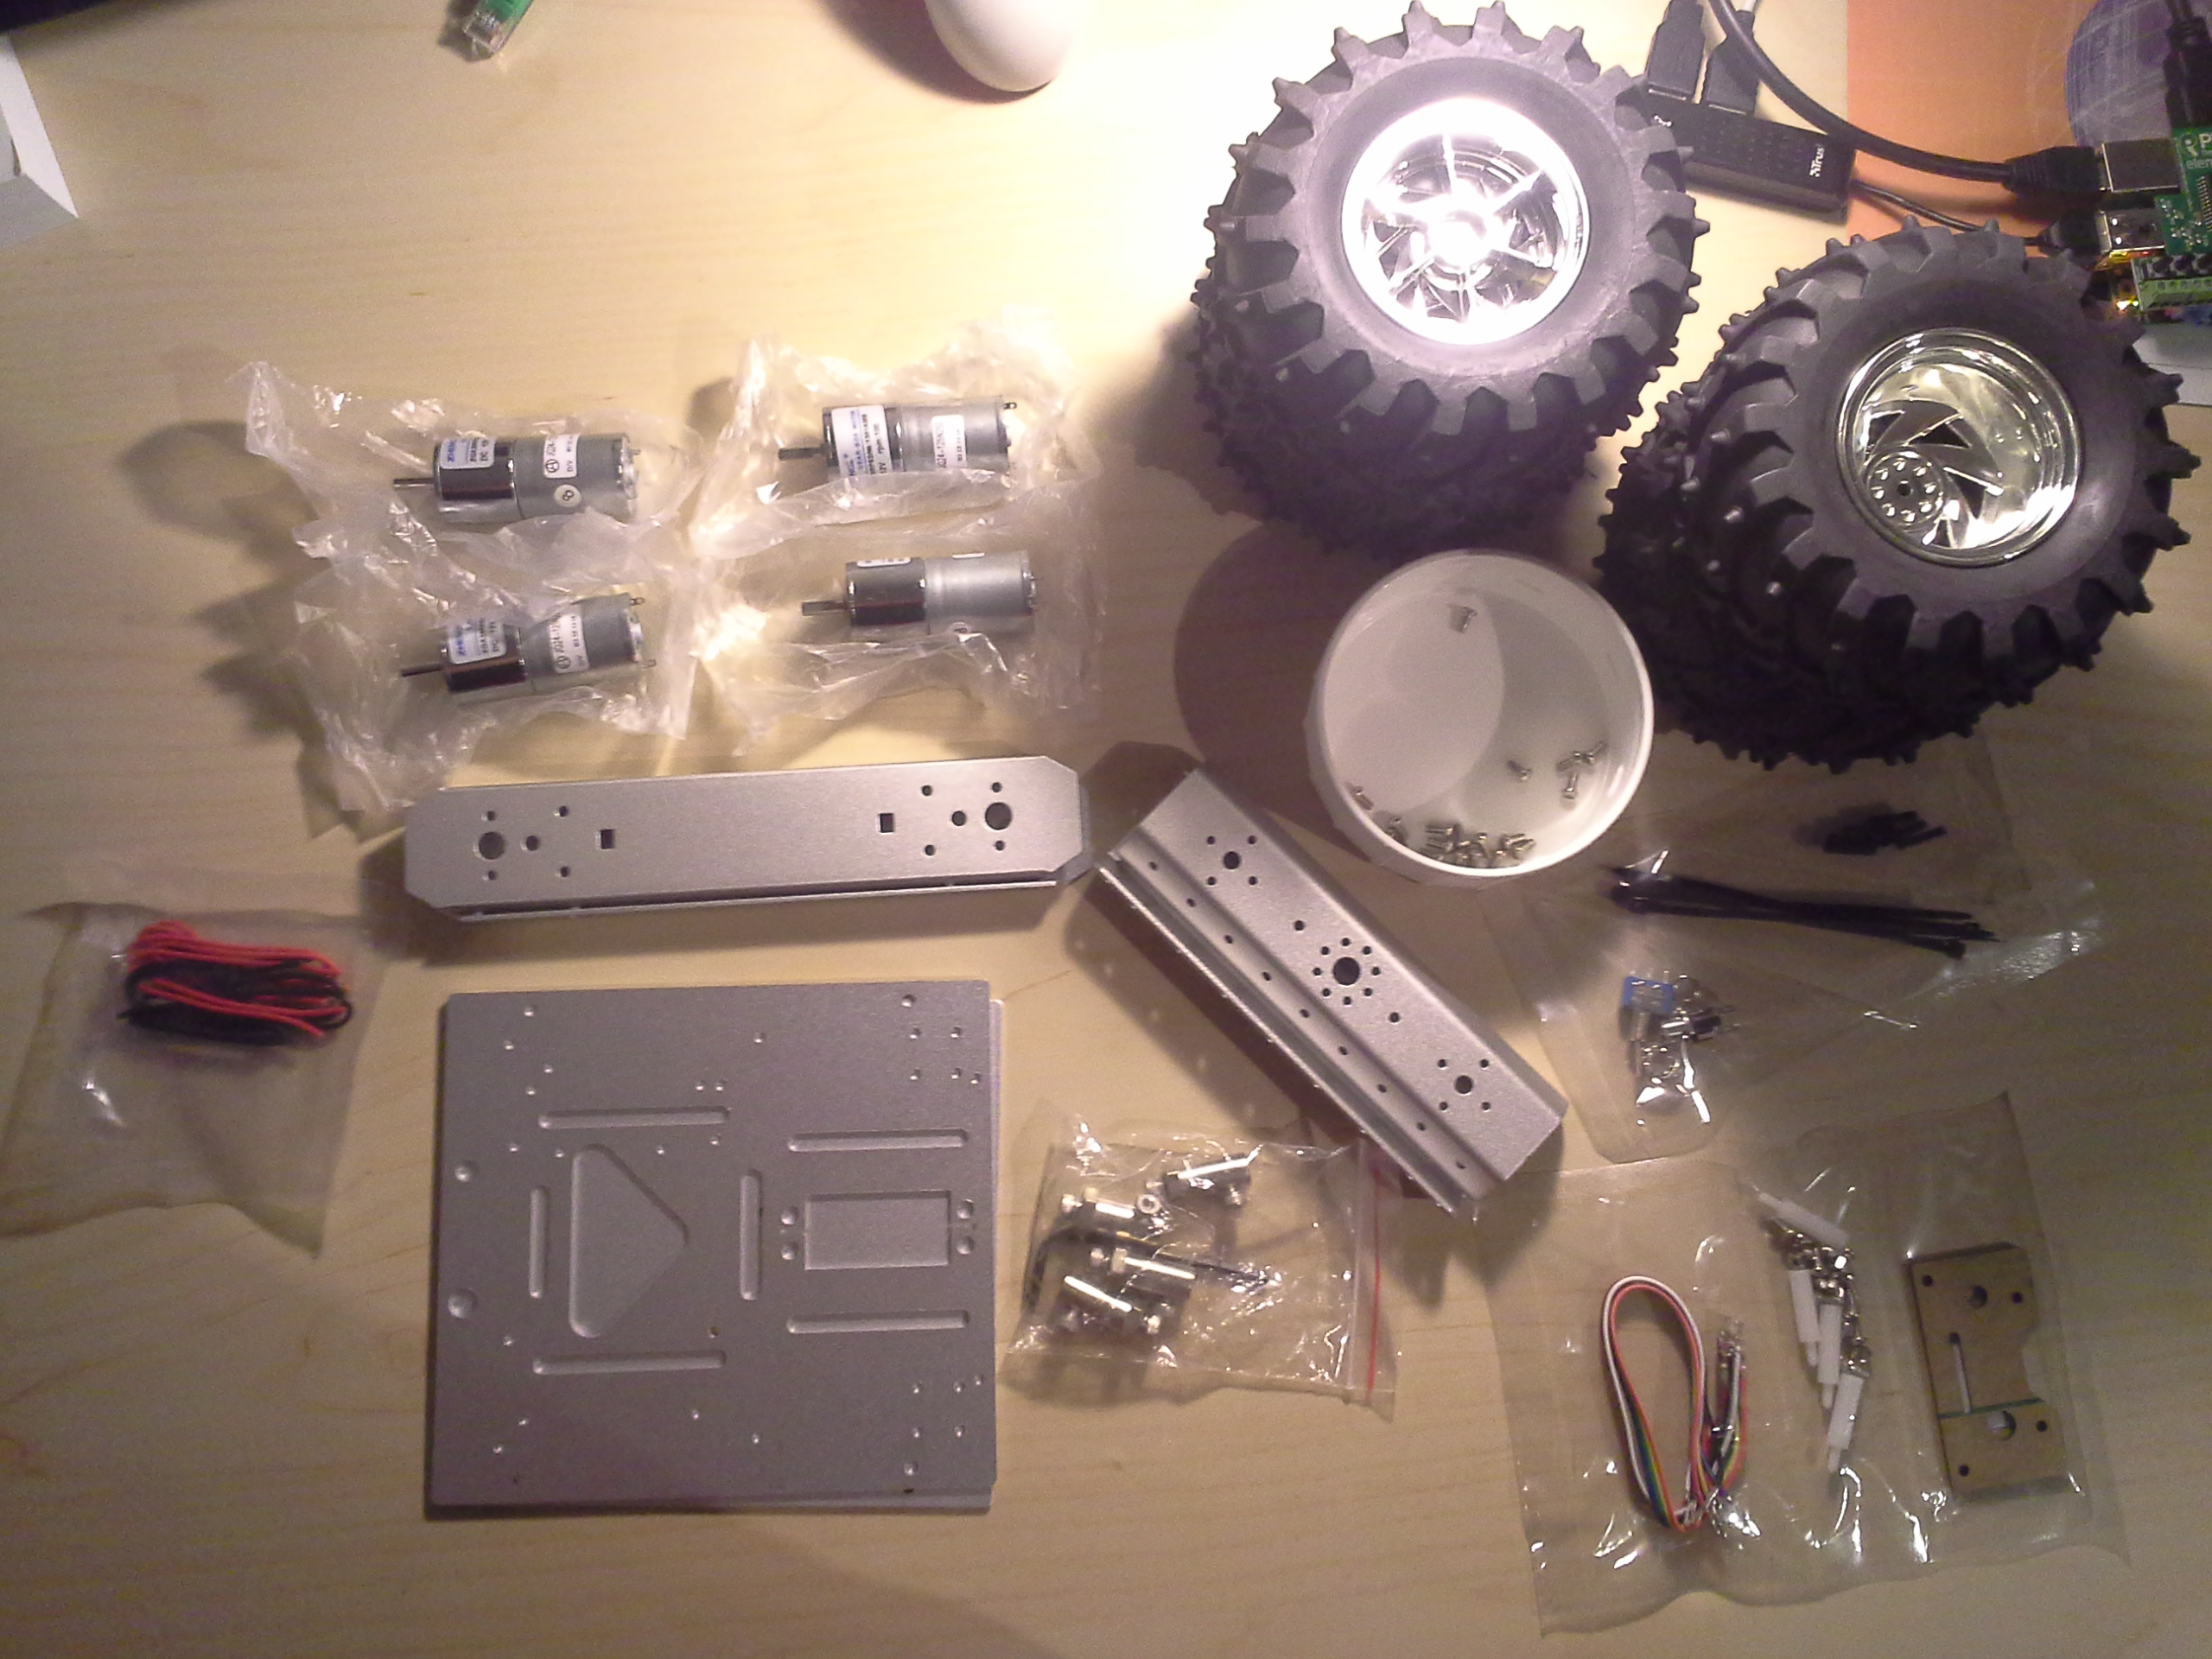 Bild 01: Packungsinhalt des 4WD Aluminium Mobile Robot Platform